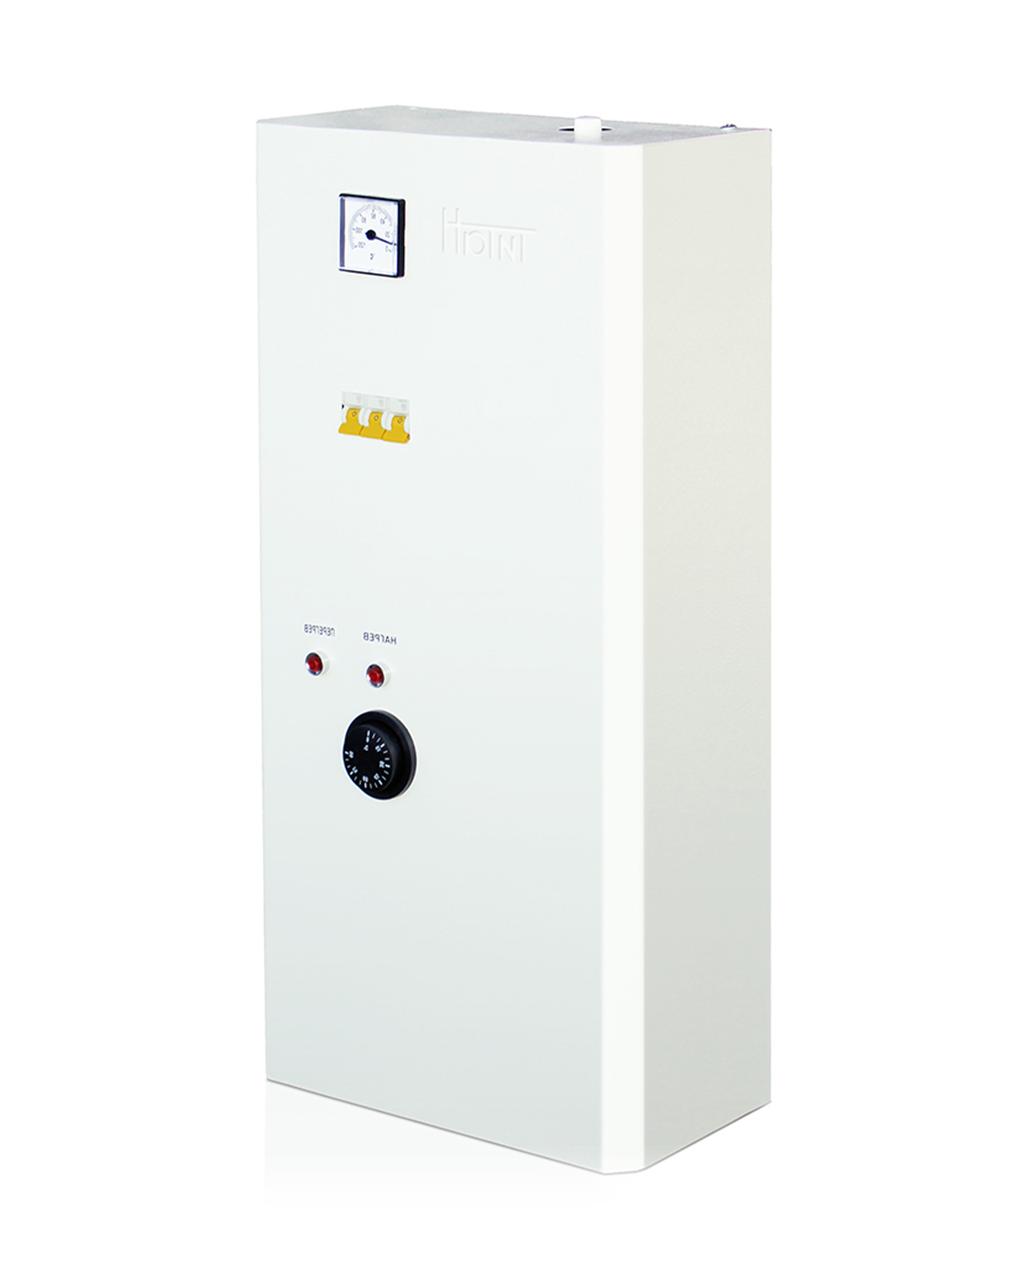 Электрический котел Титан Мини Настенный, 4.5 кВт 220 В